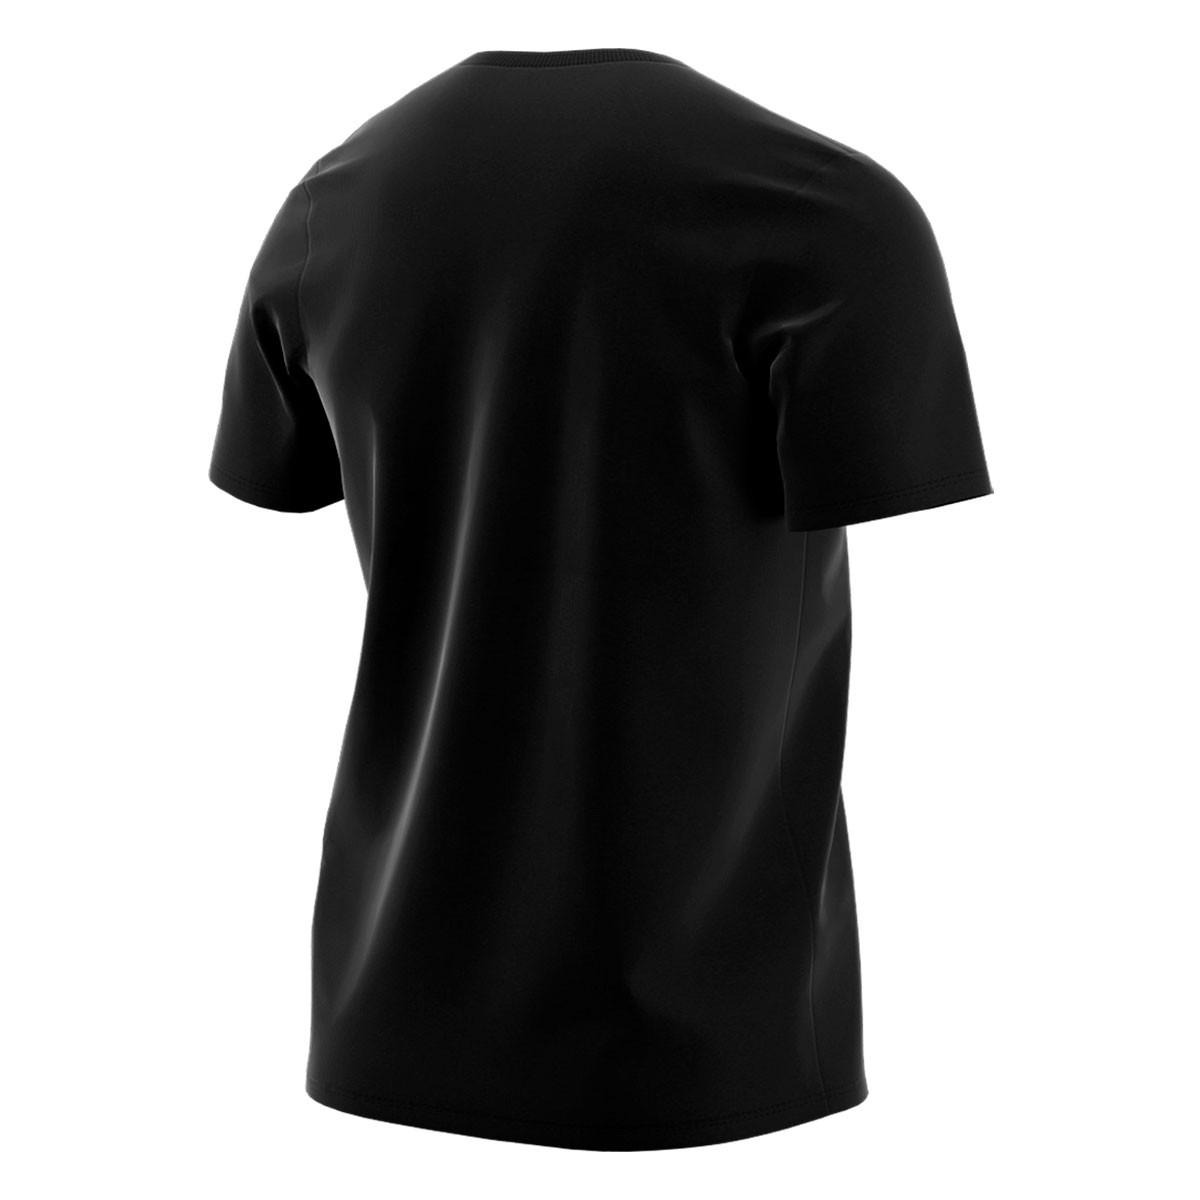 Camiseta Nike Corinthians Evergre Preto